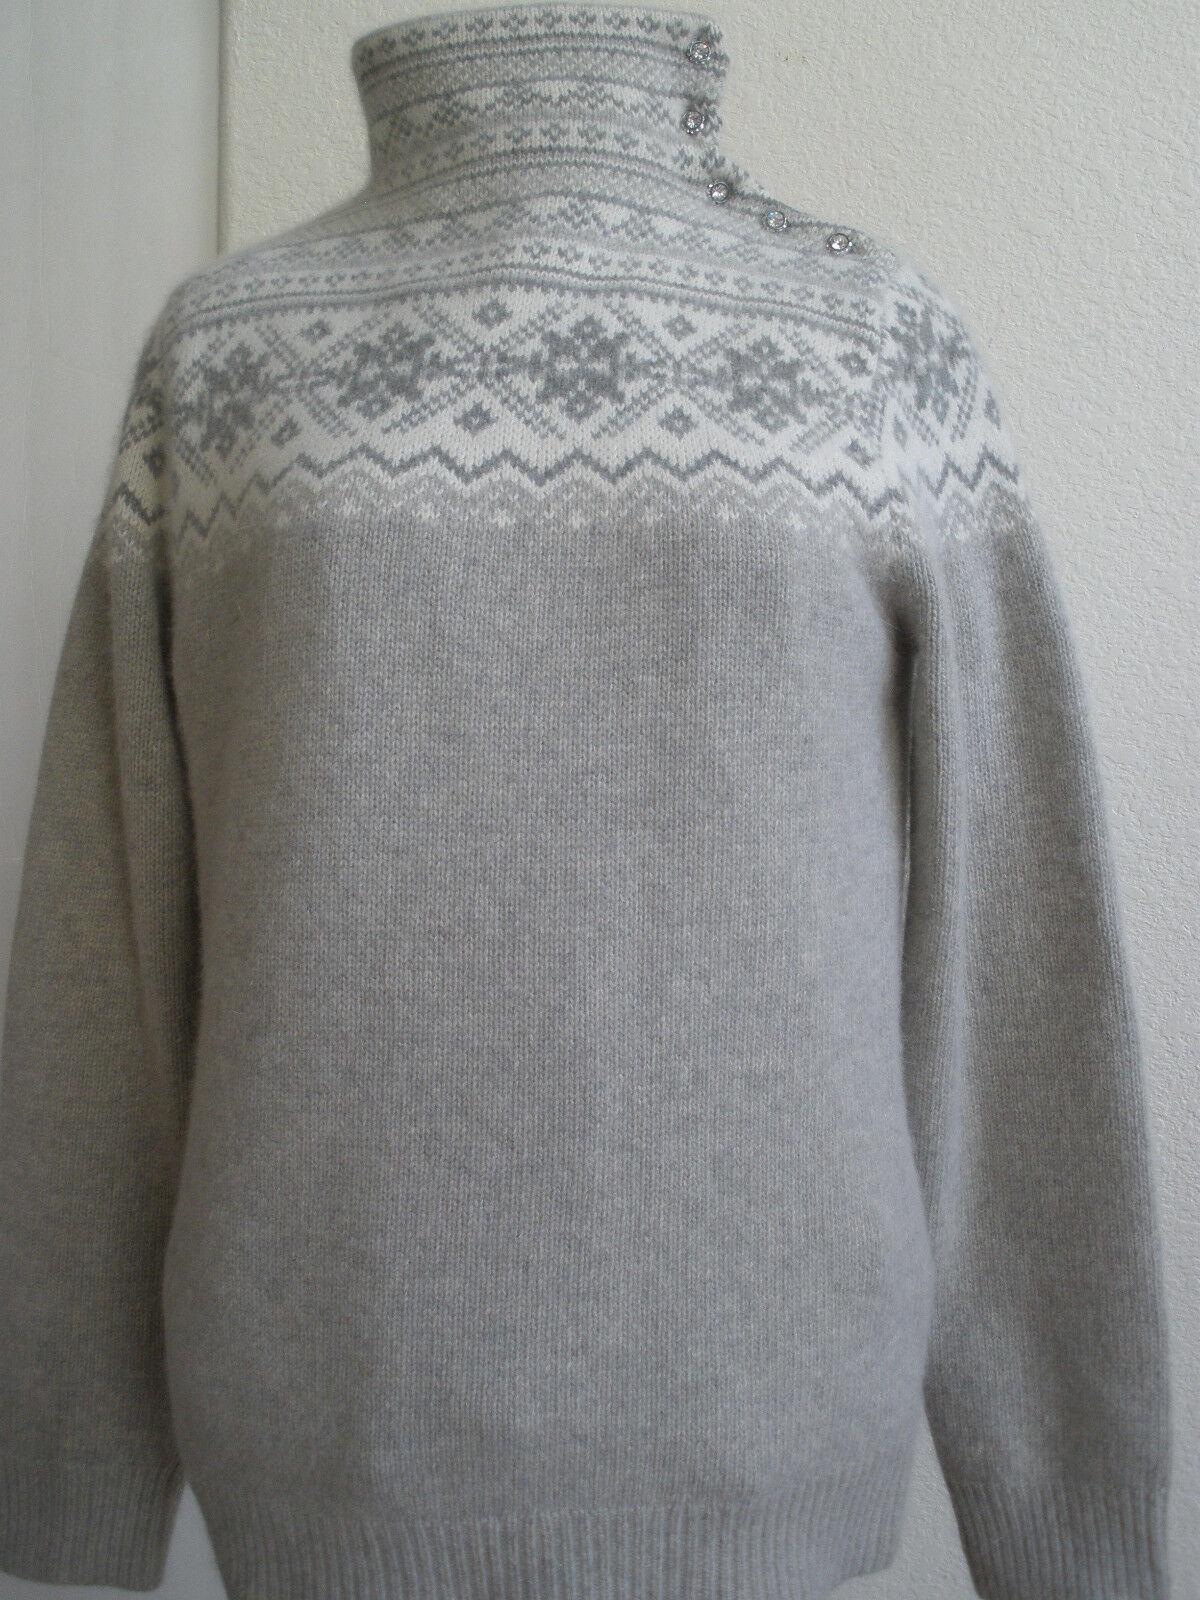 LAUREN Ralph Lauren EXCLUSIVE Soft Wool Blend sweater size L STUNNING MUST HAVE